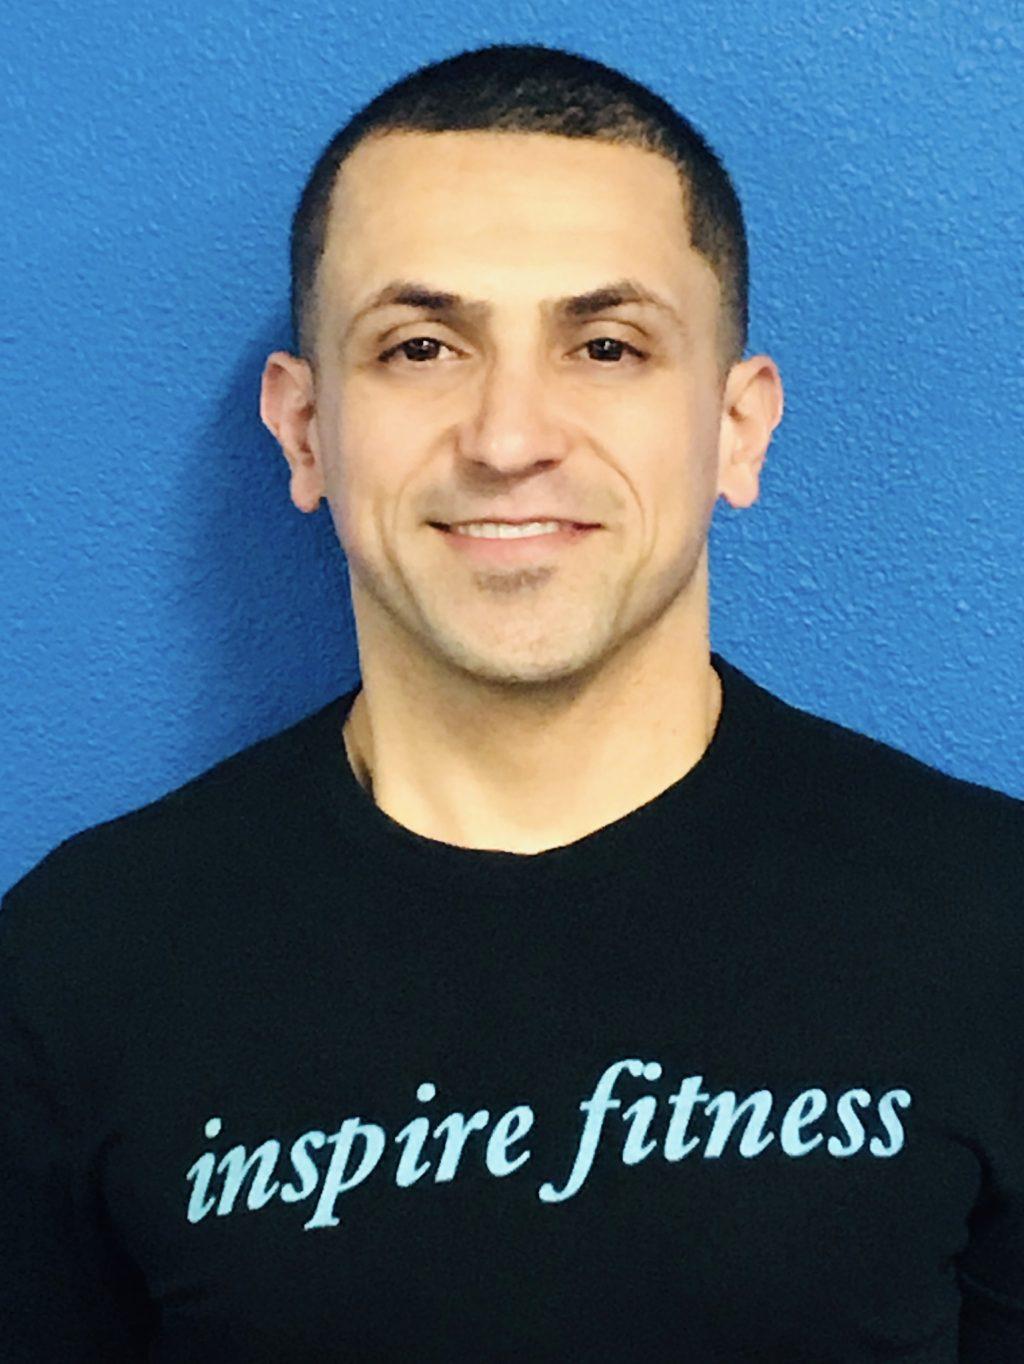 Personal Trainer Austin, Texas - Ayman Shehadeh